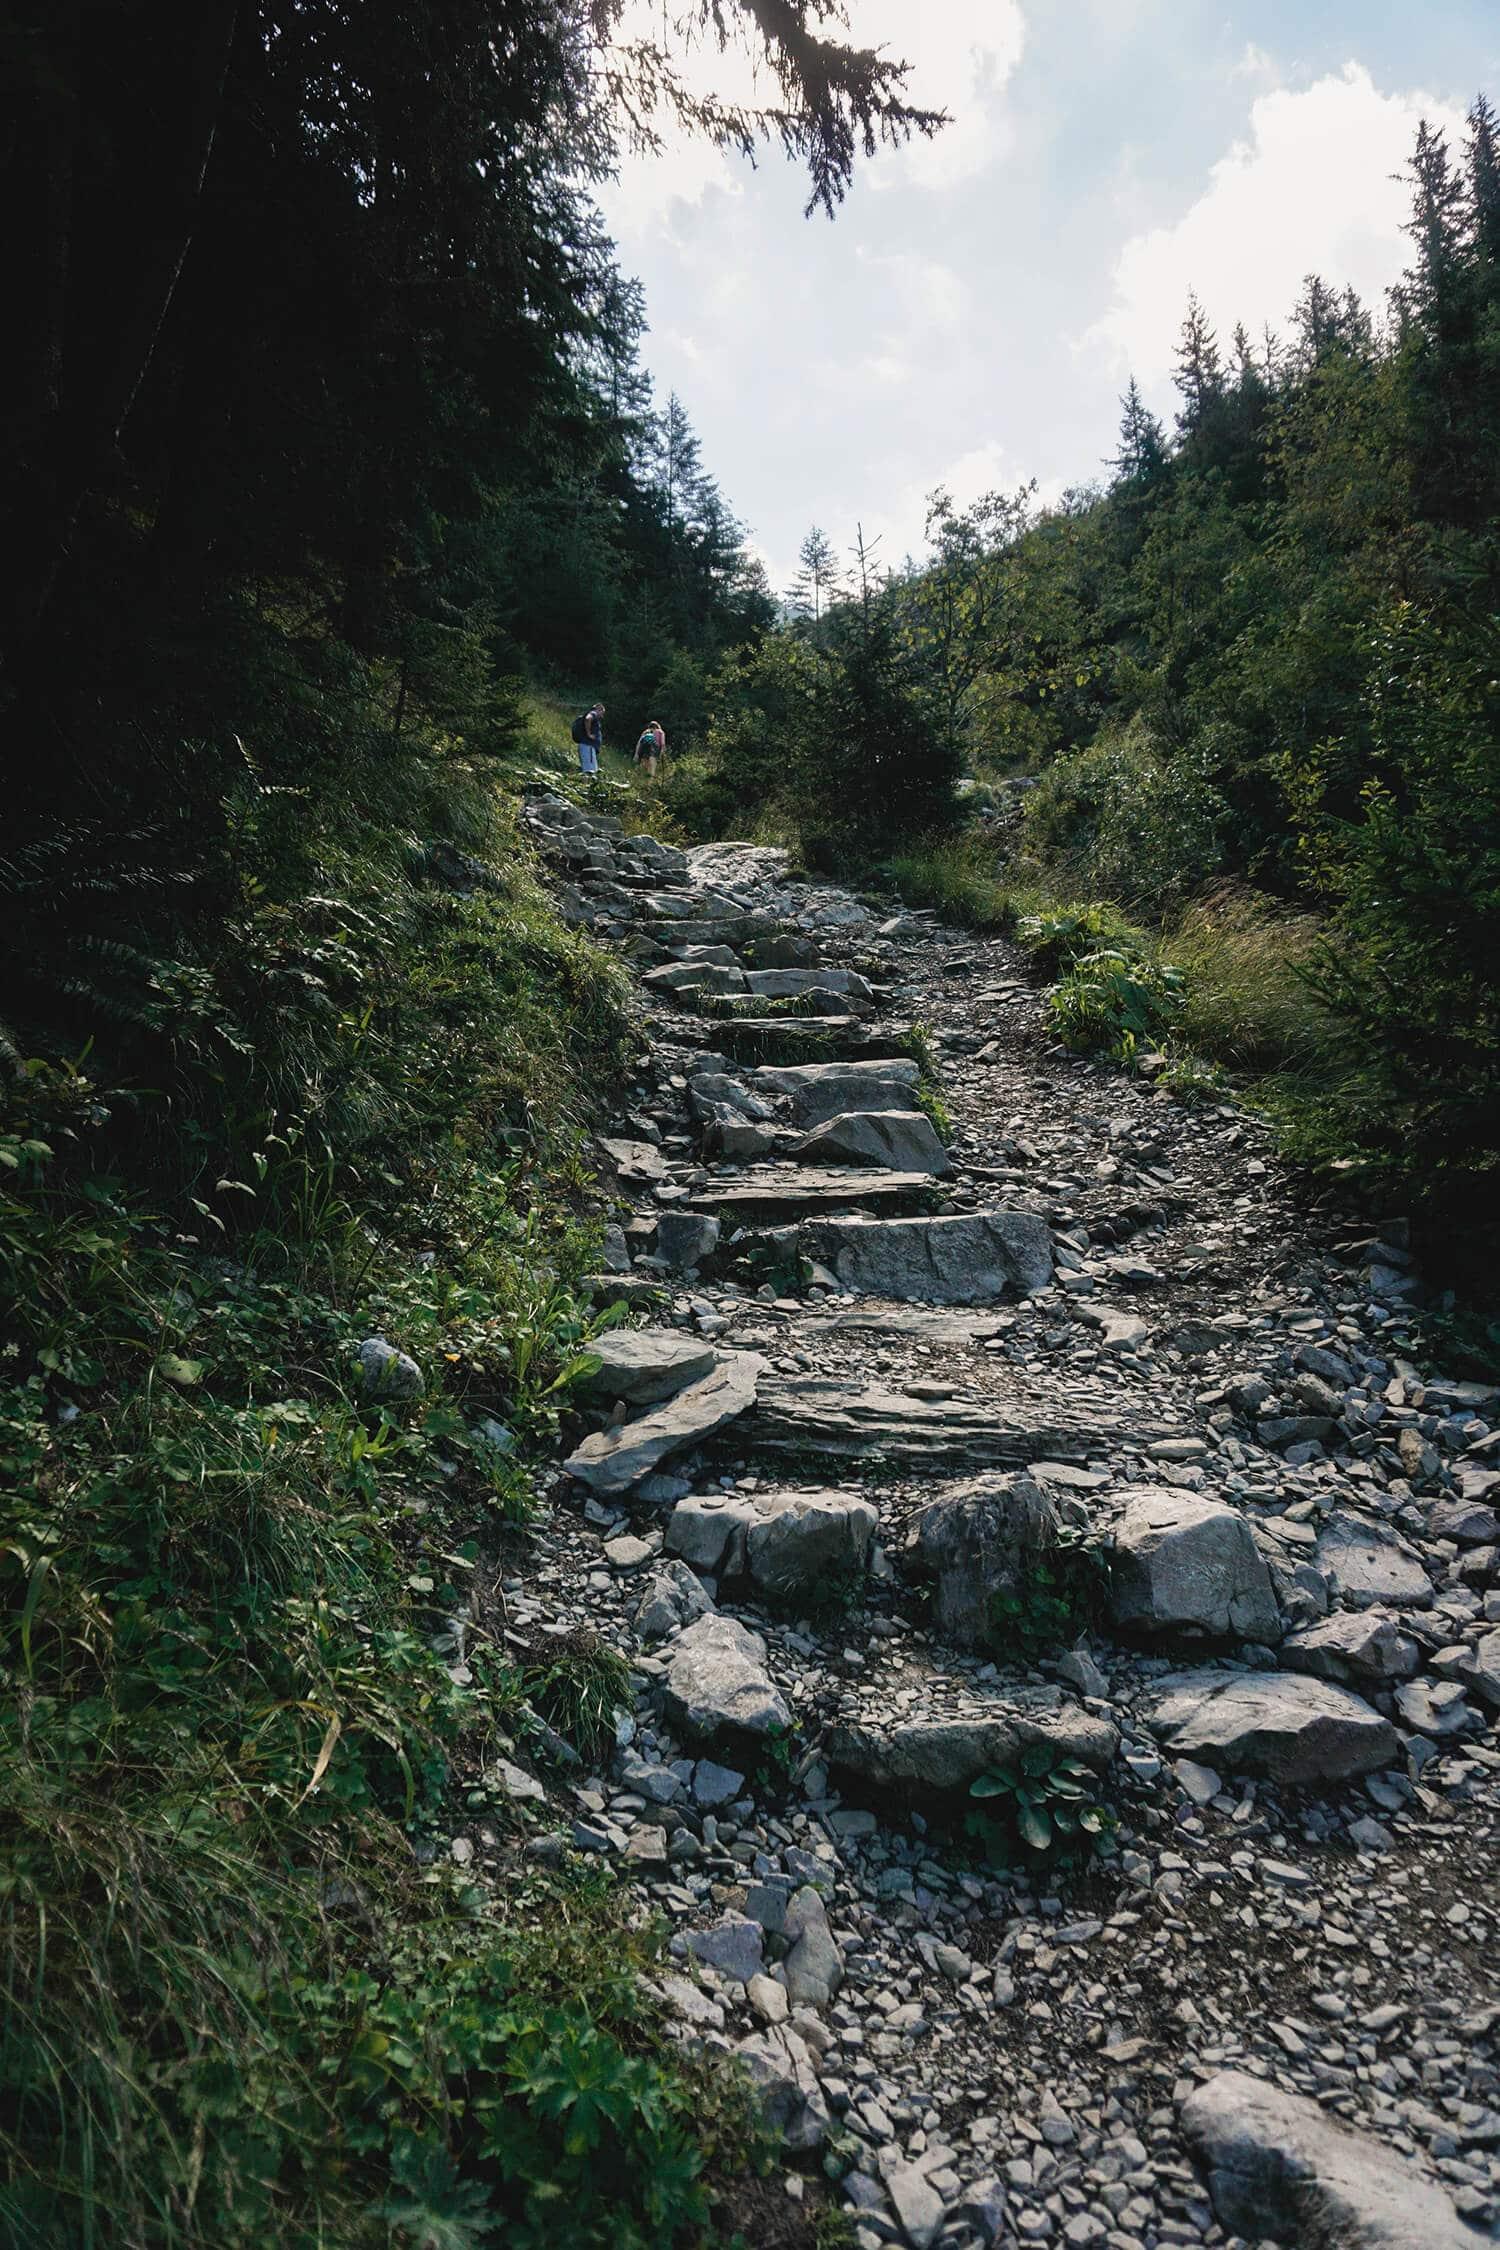 https://tripmapworld.com/wp-content/uploads/2019/03/stony-trail-tatra-mountains.jpg